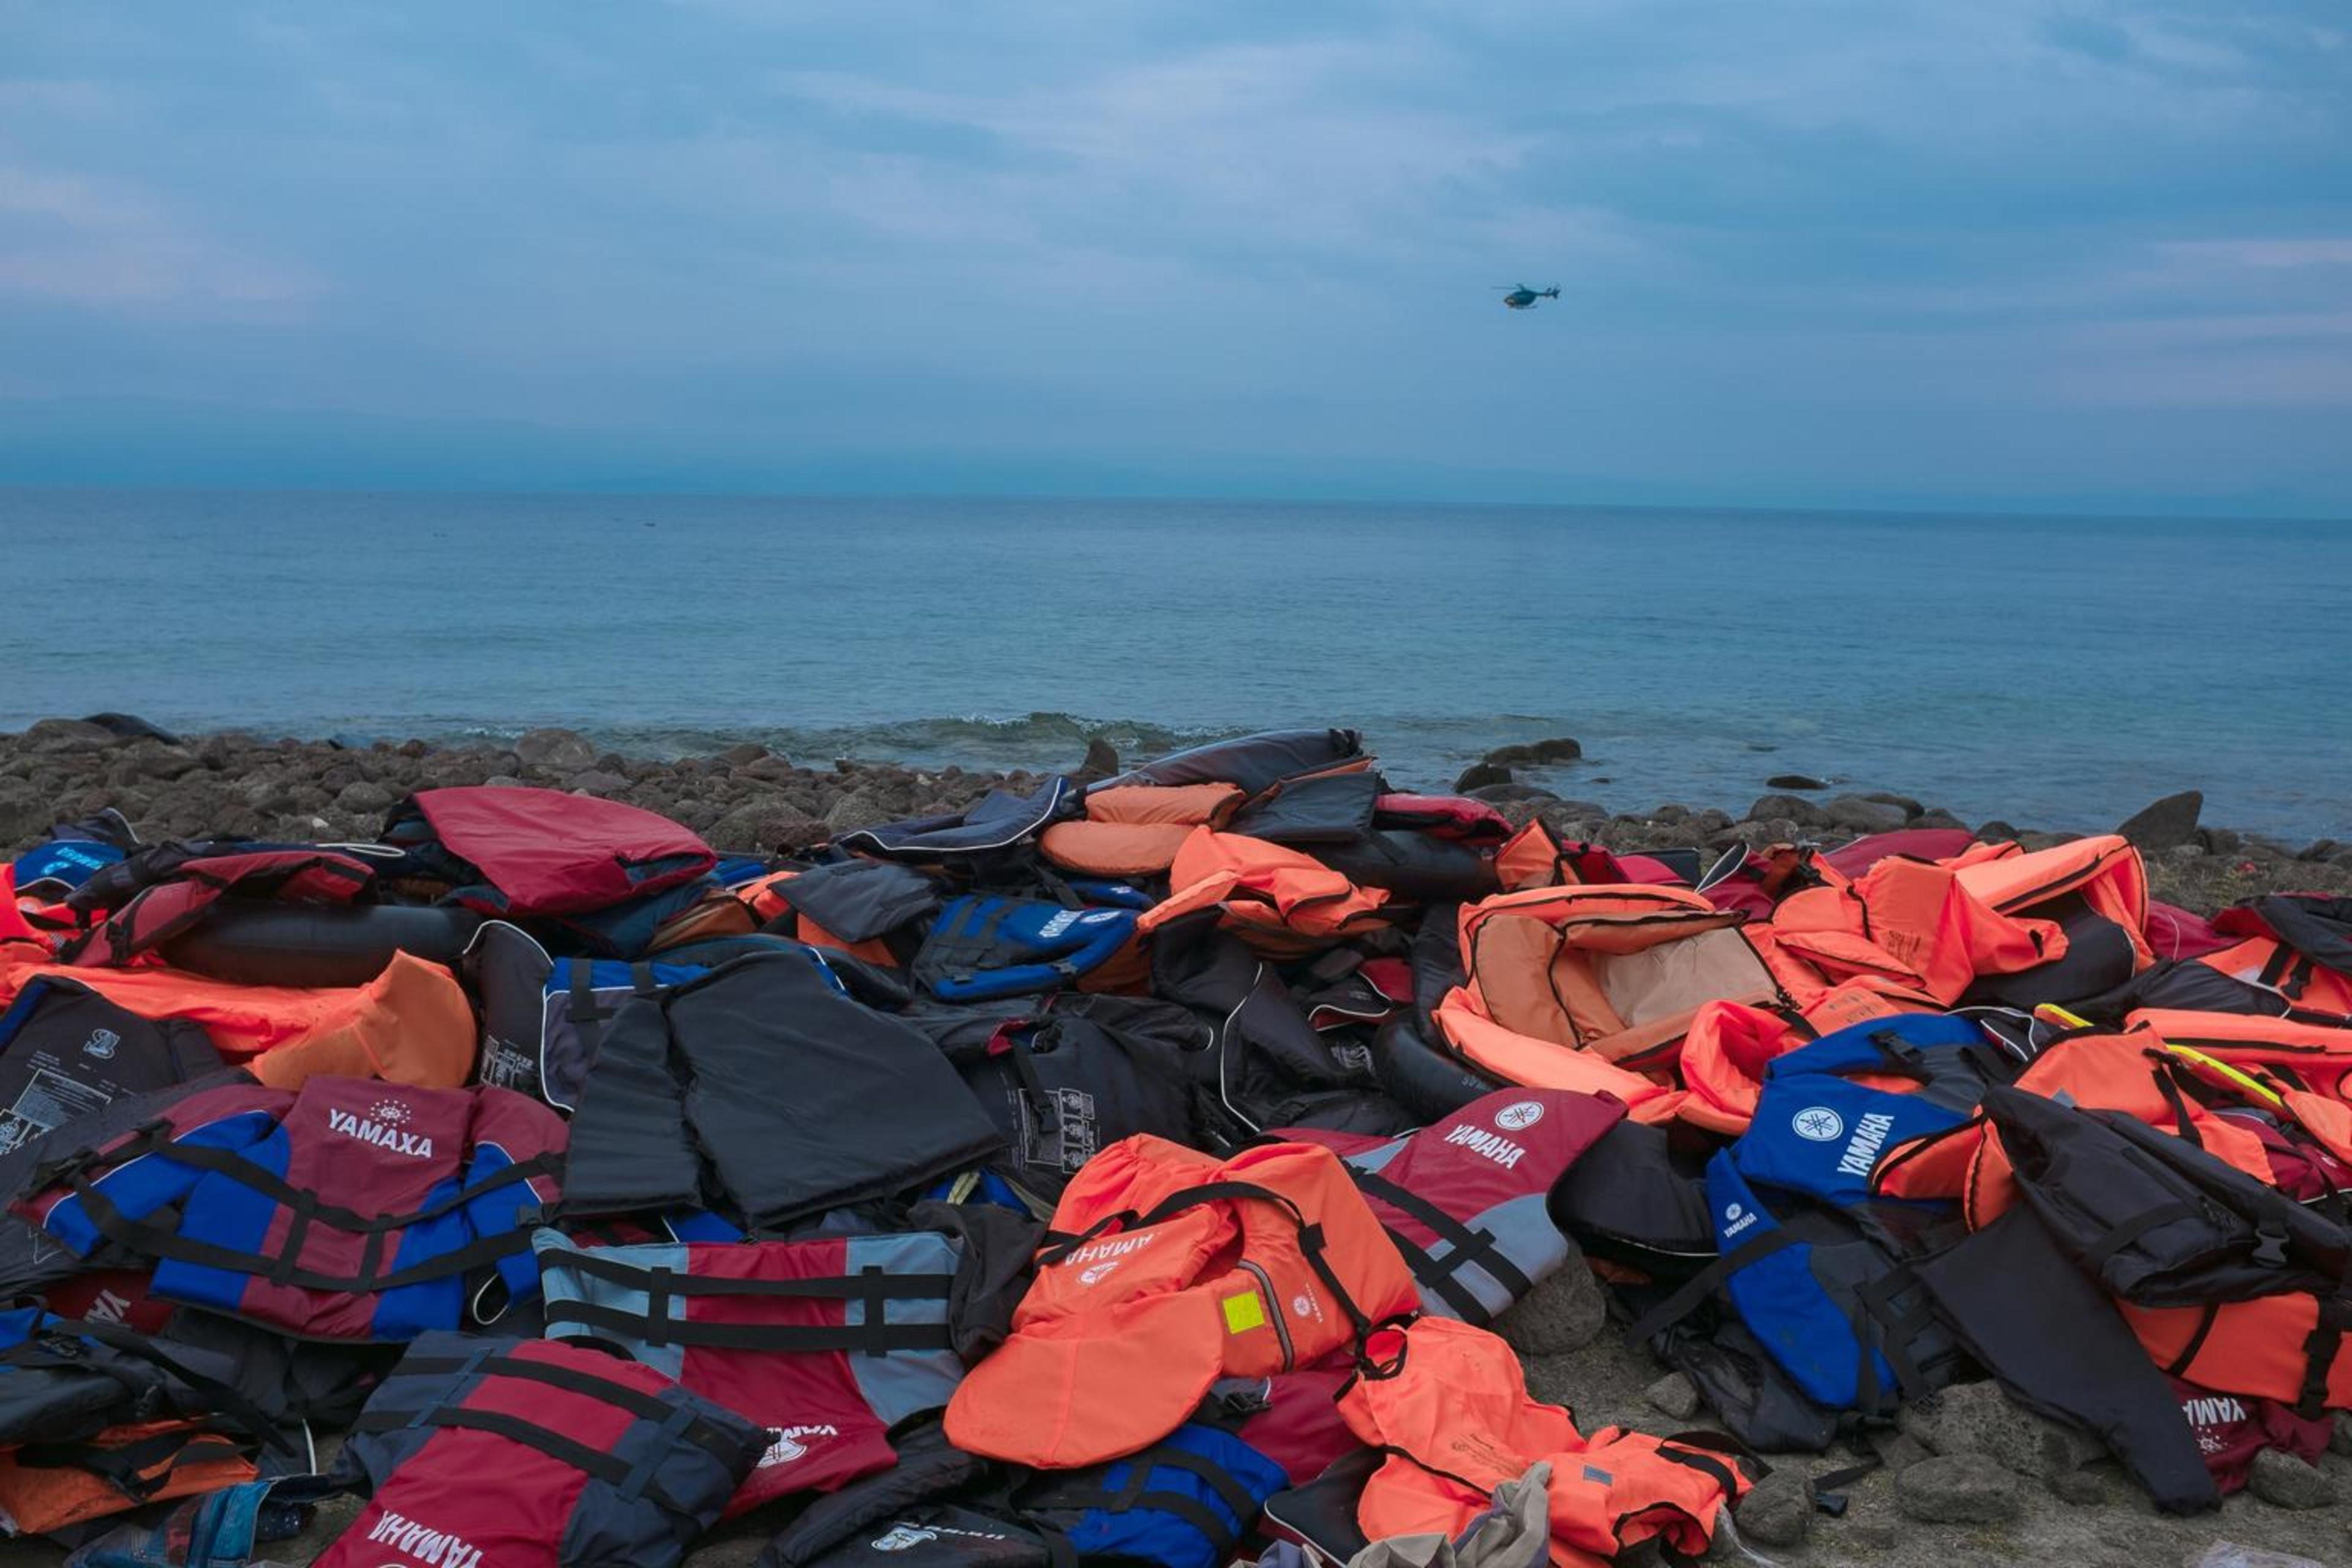 © UNICEF/UNI197225/Gilbertson VII Photo